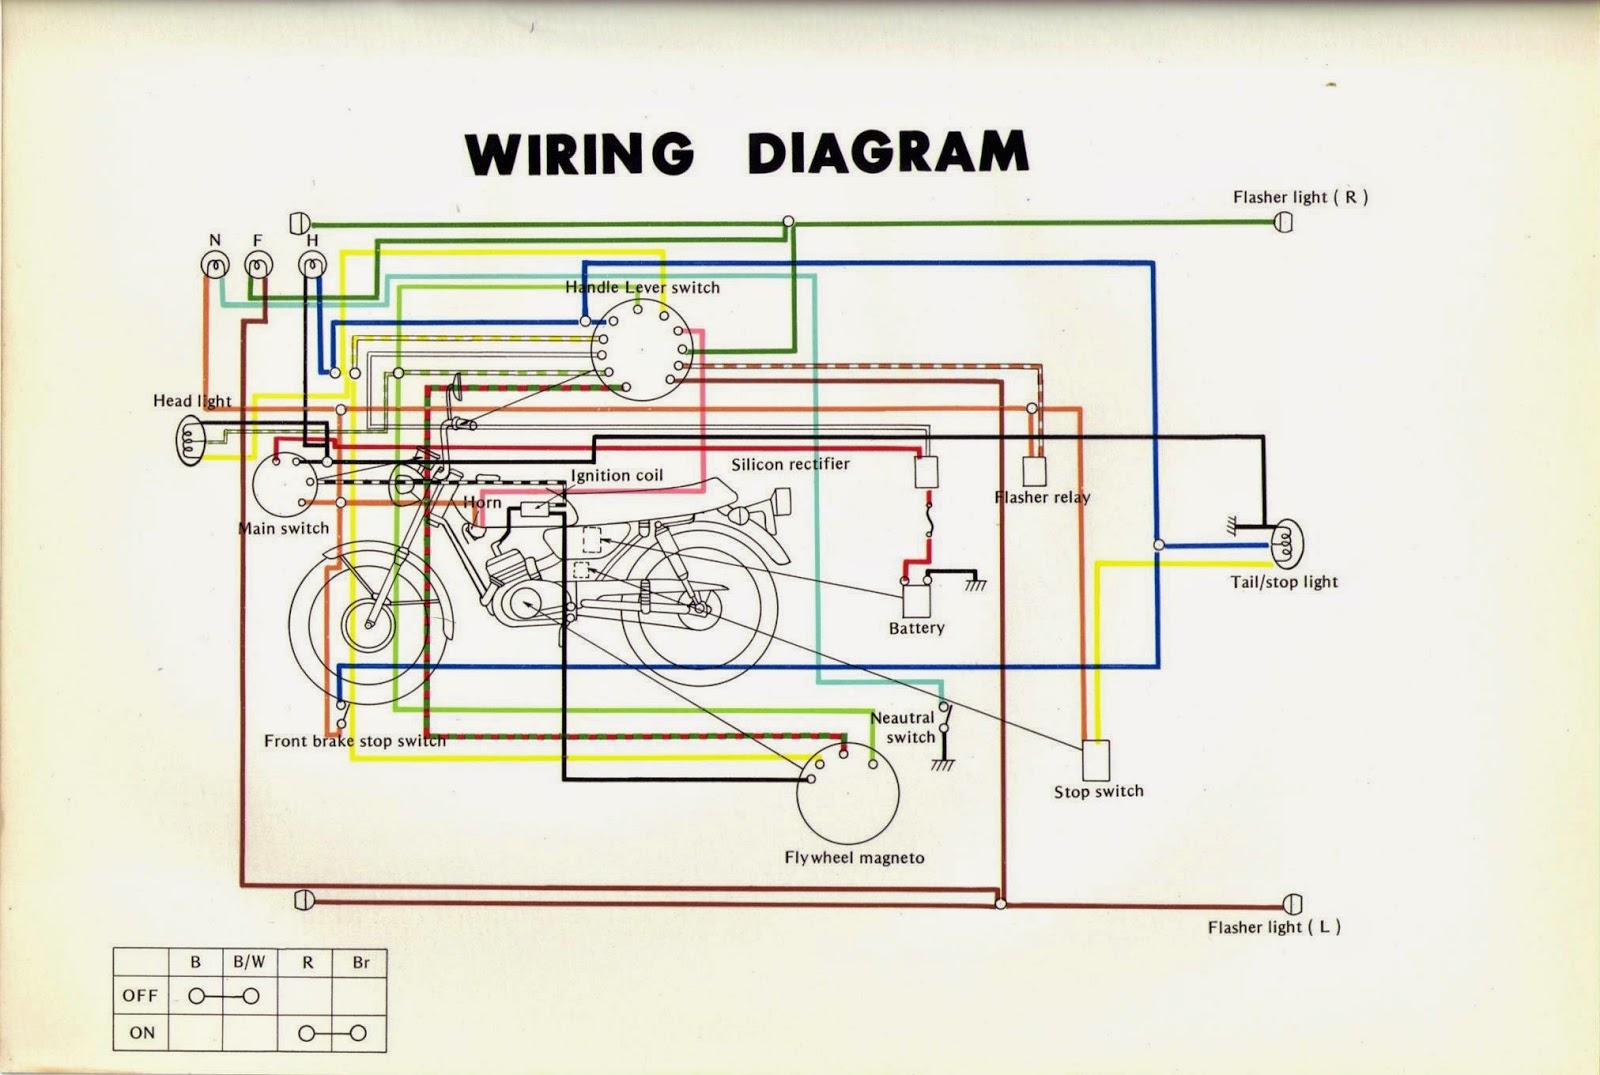 Hd wallpapers wiring diagram yamaha vega zr desktop53mobile get free high quality hd wallpapers wiring diagram yamaha vega zr cheapraybanclubmaster Images